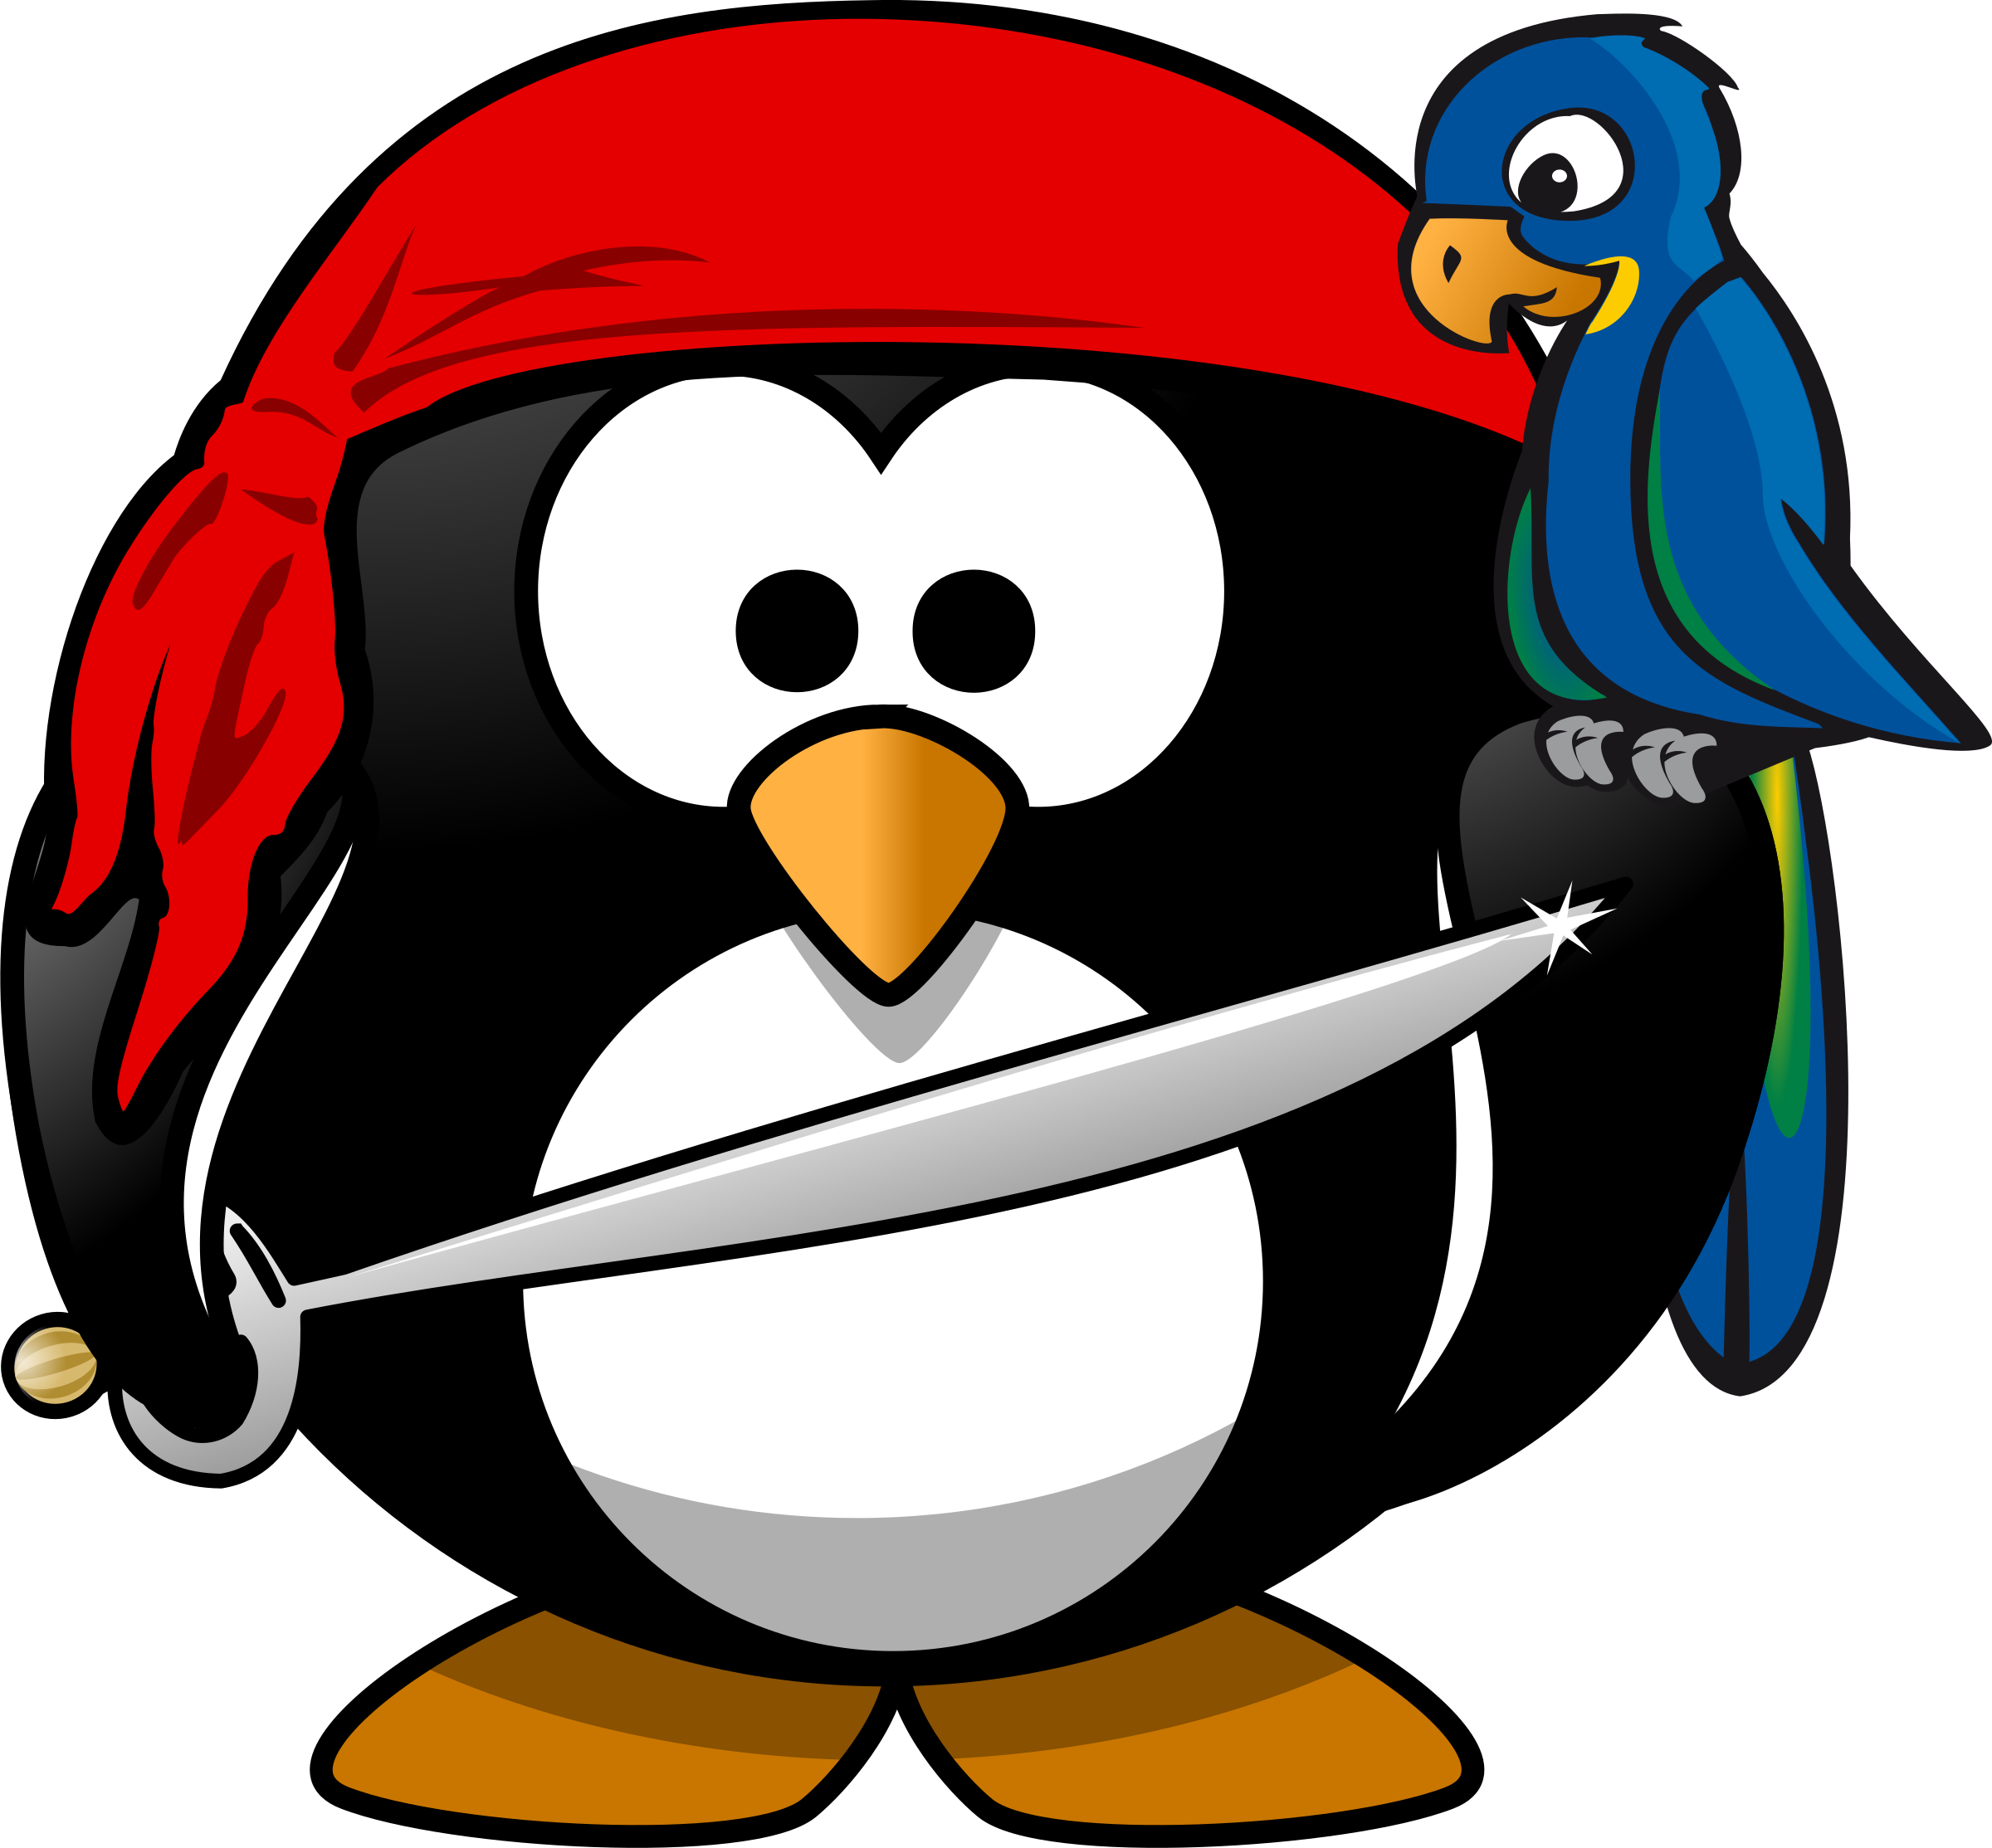 Lifeguard clipart border. Cartoon penguin free download